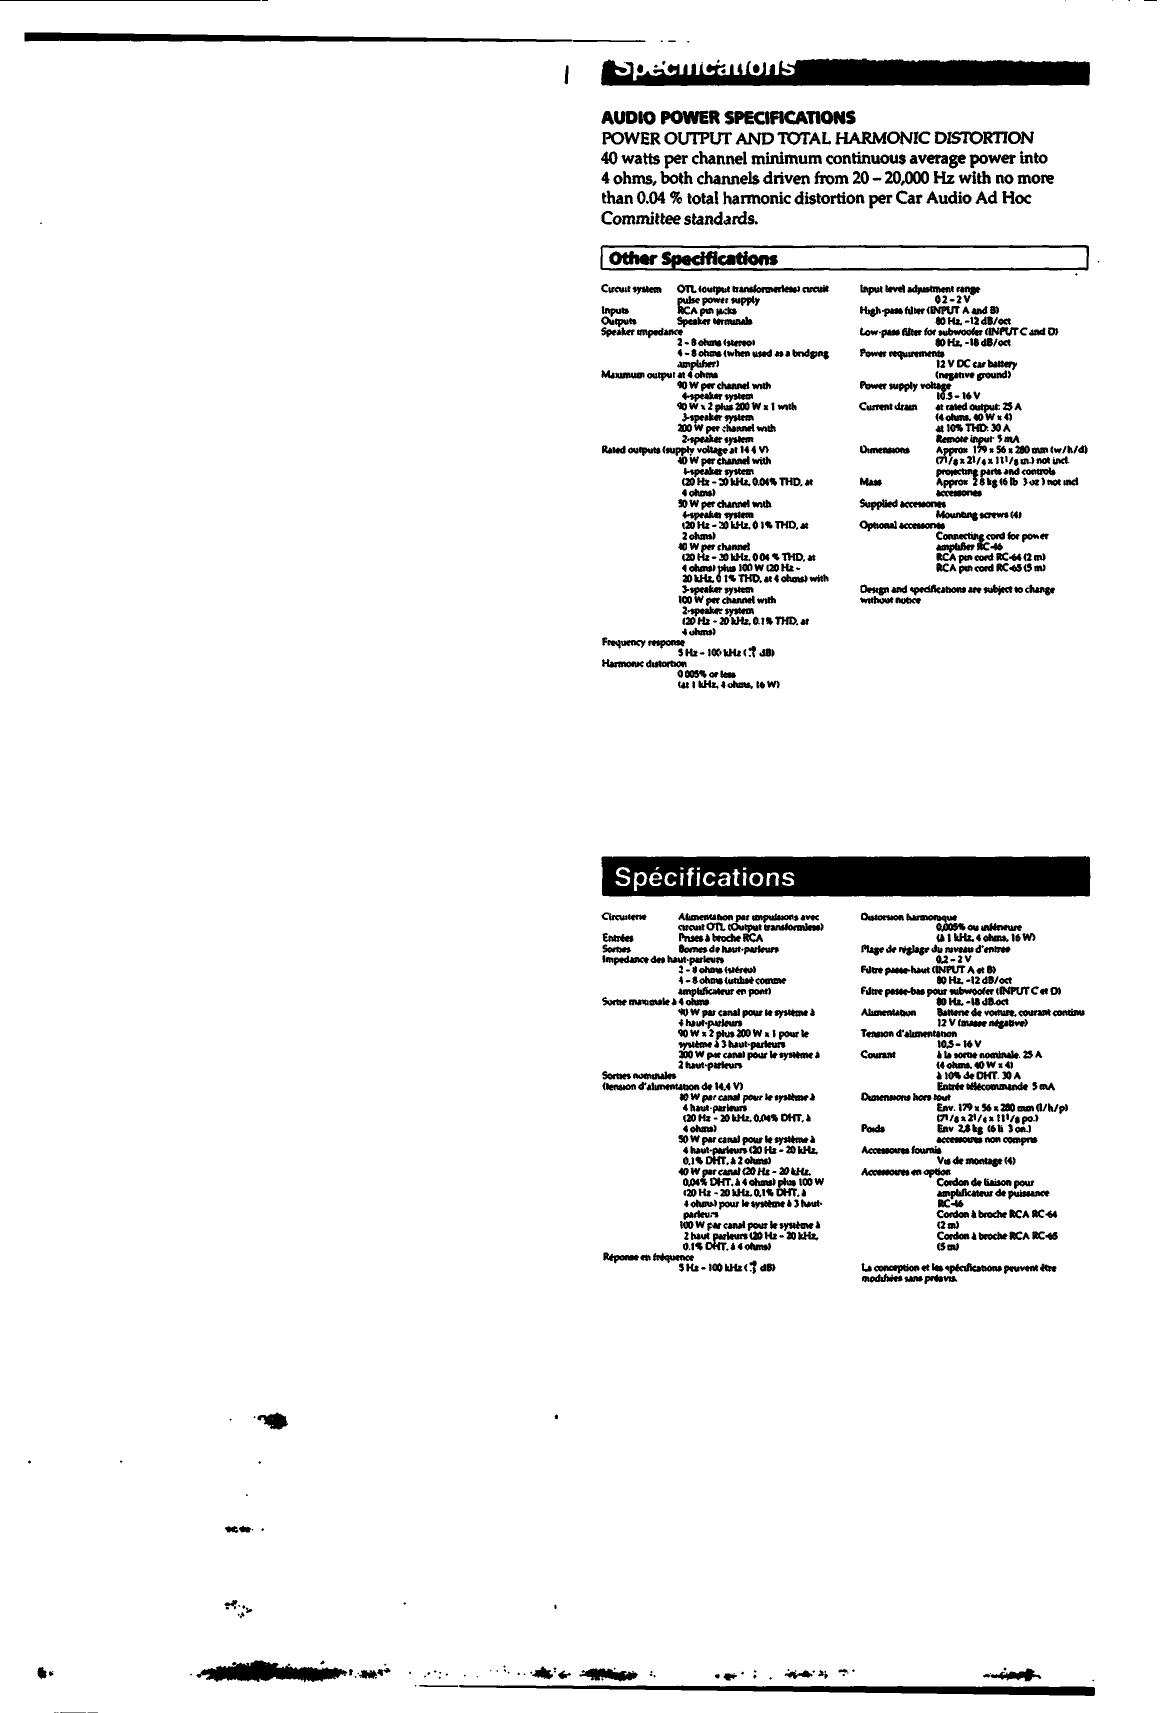 Sony Xm 4045 Users Manual